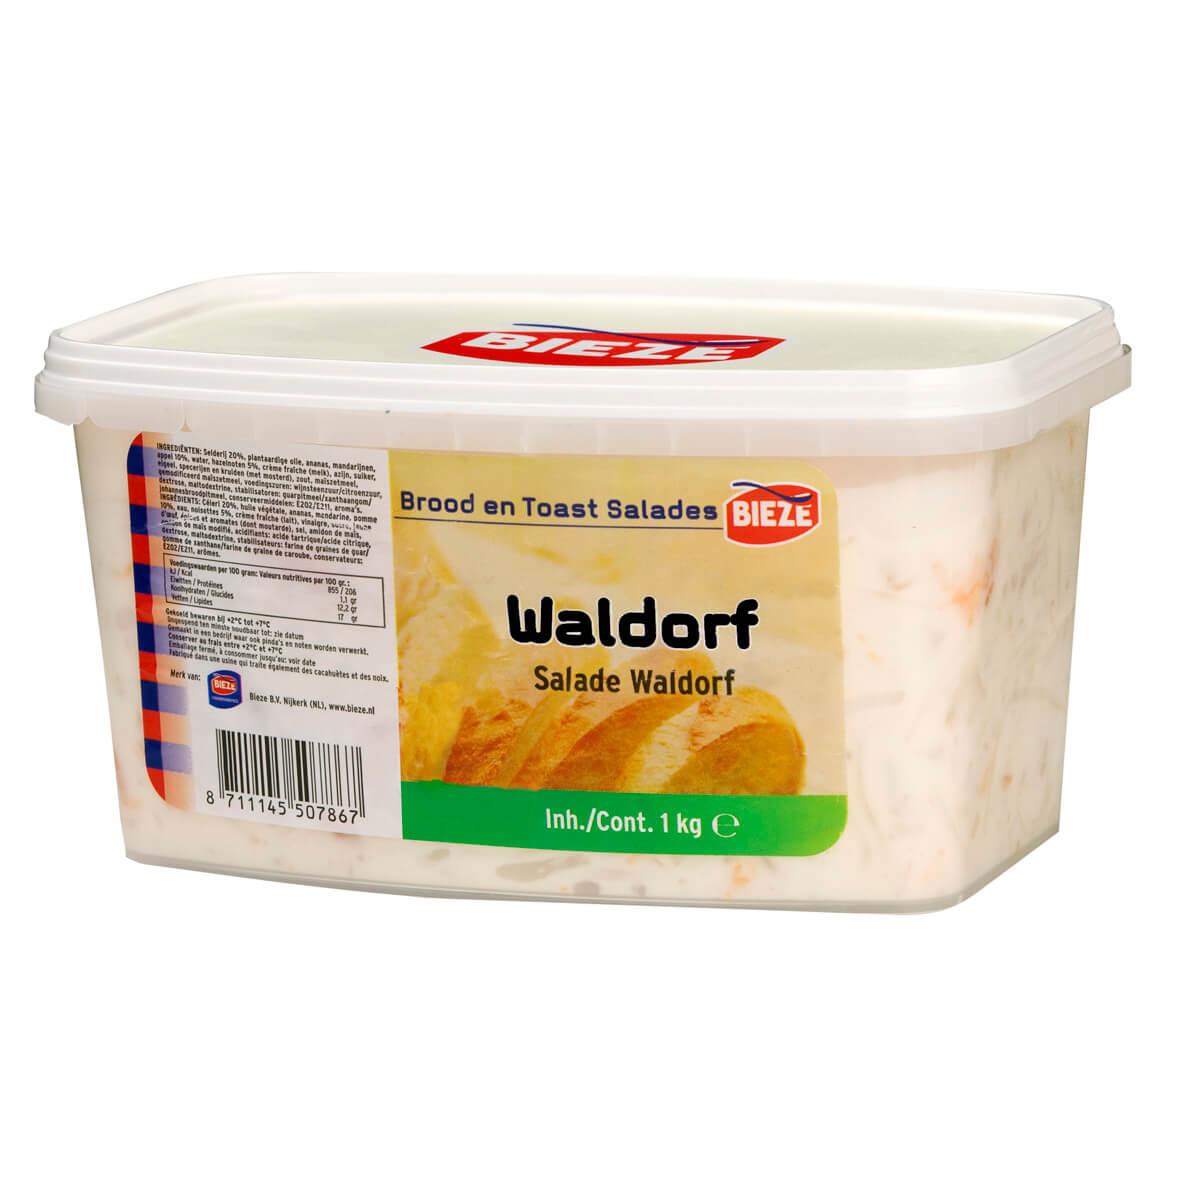 WALDORF - bak